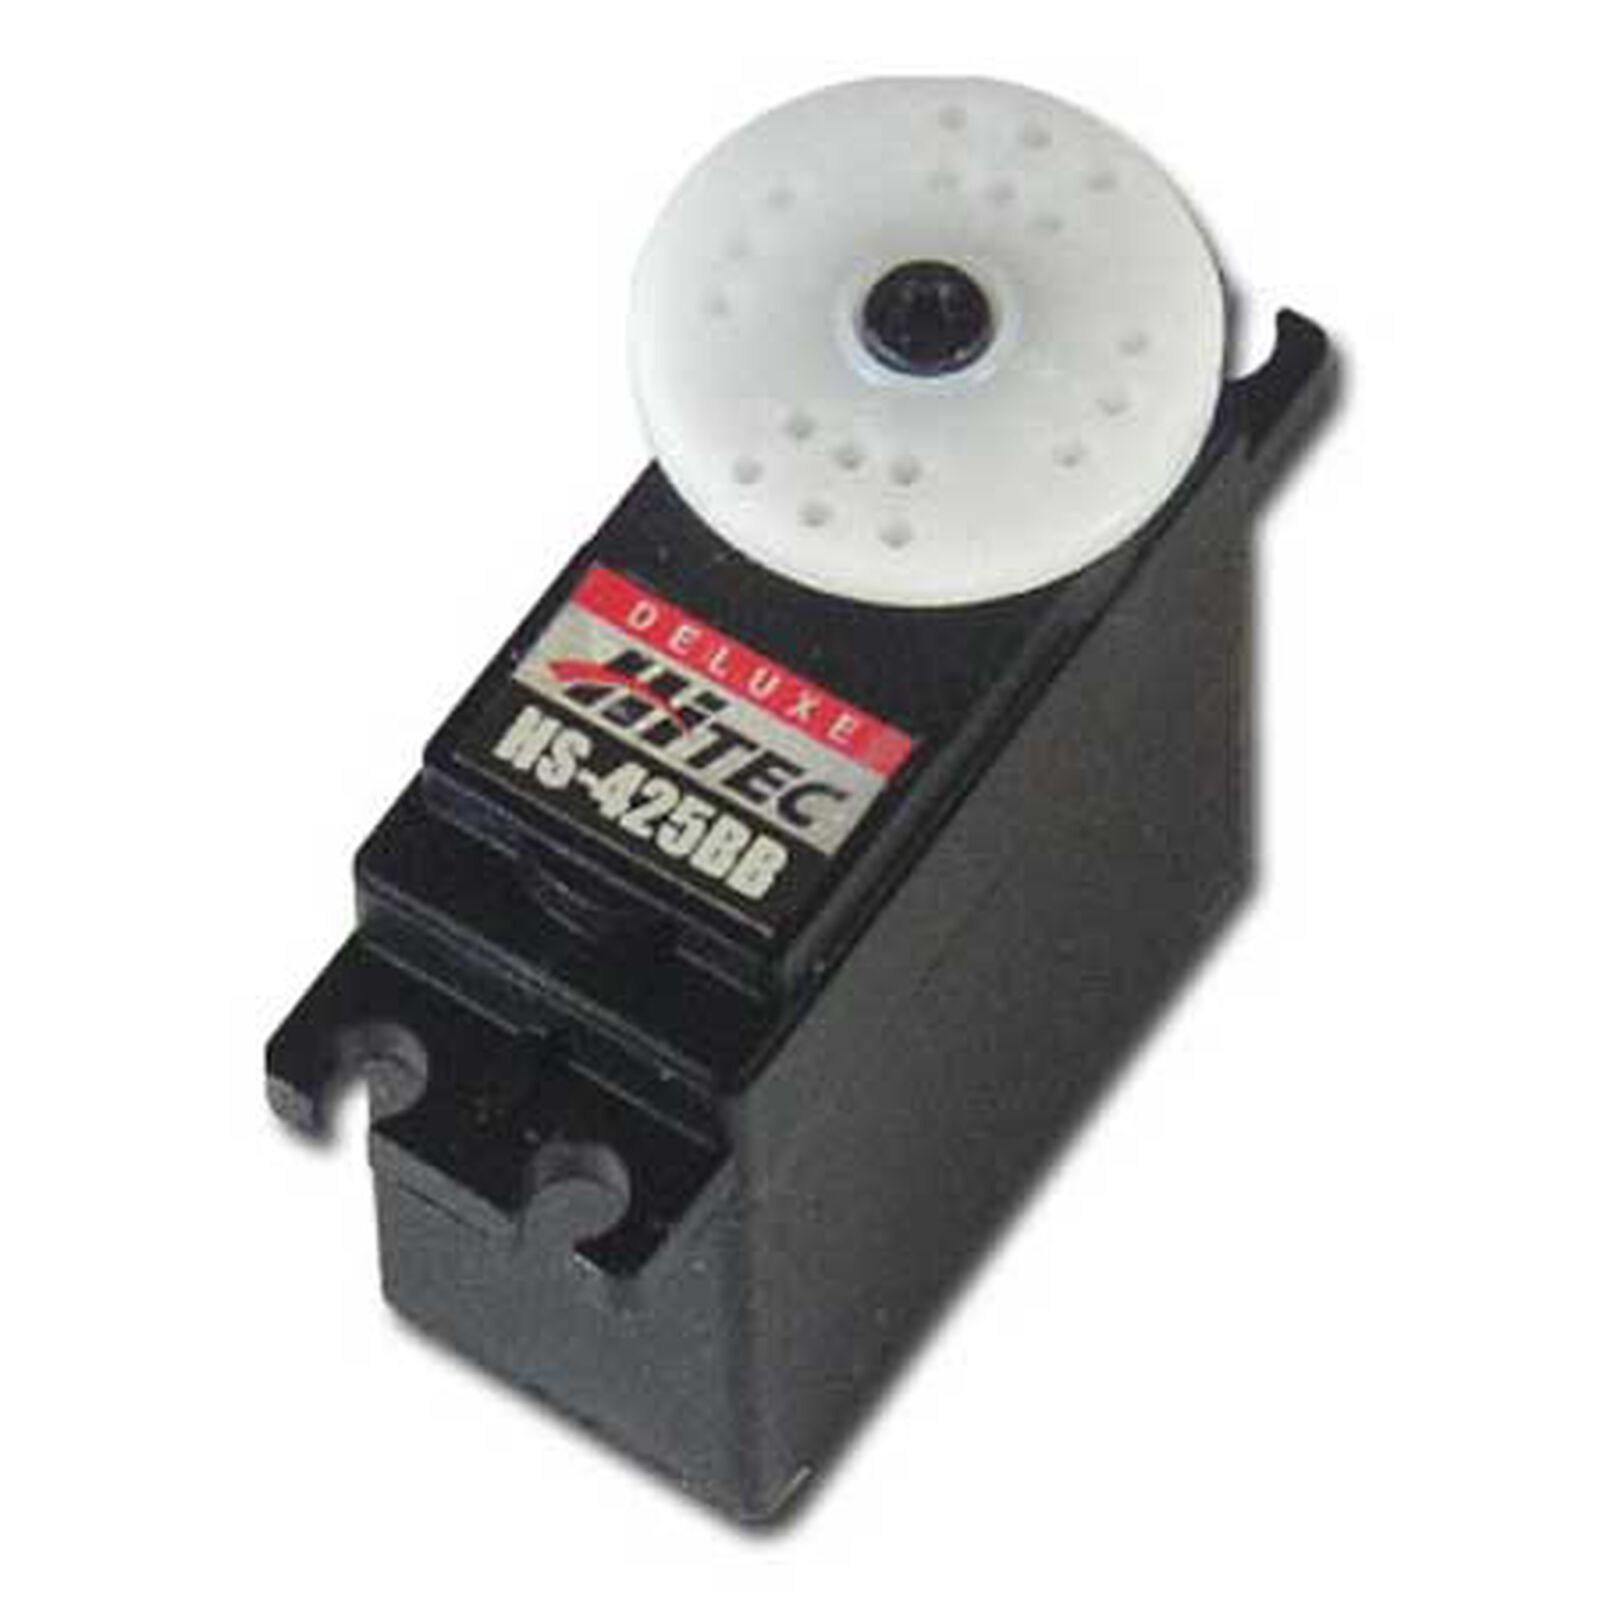 HS-425BB Standard Analog Deluxe Servo